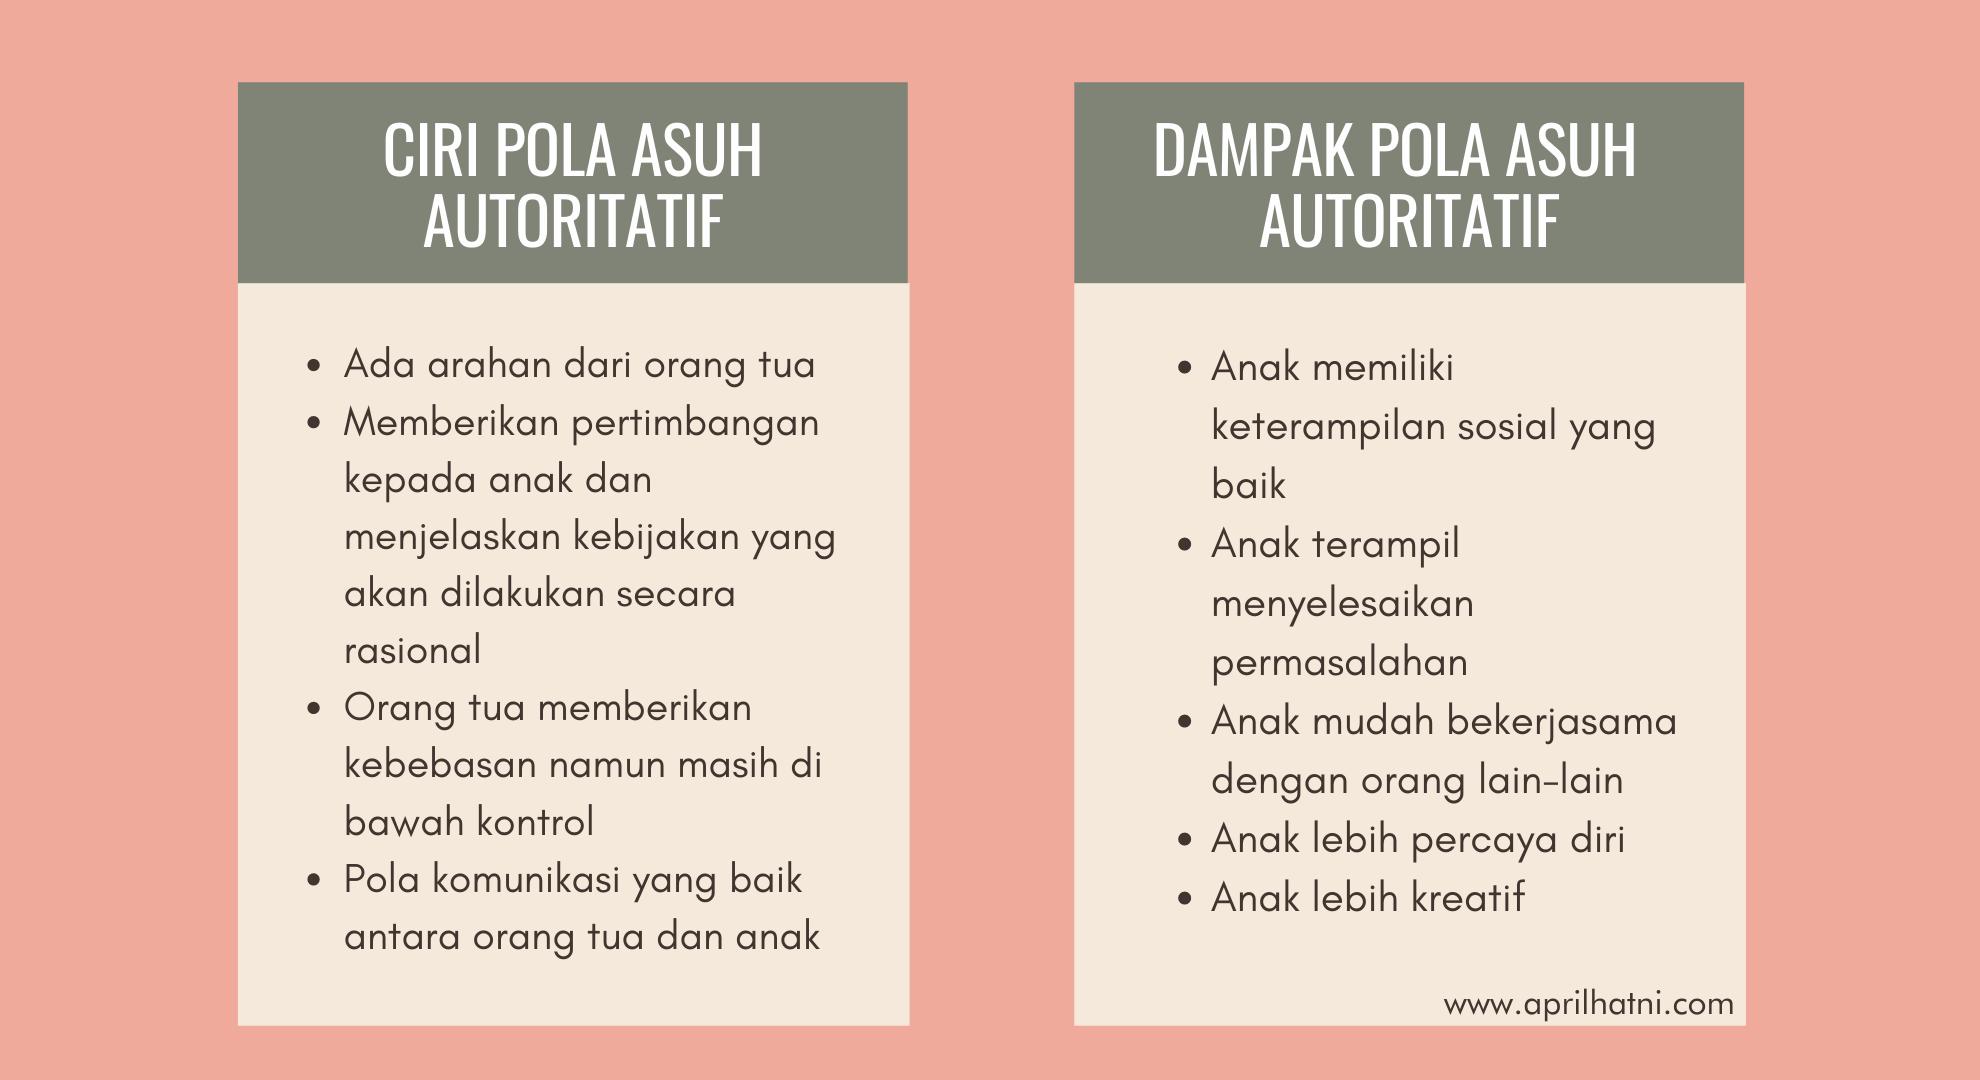 ciri pola asuh autoritatif